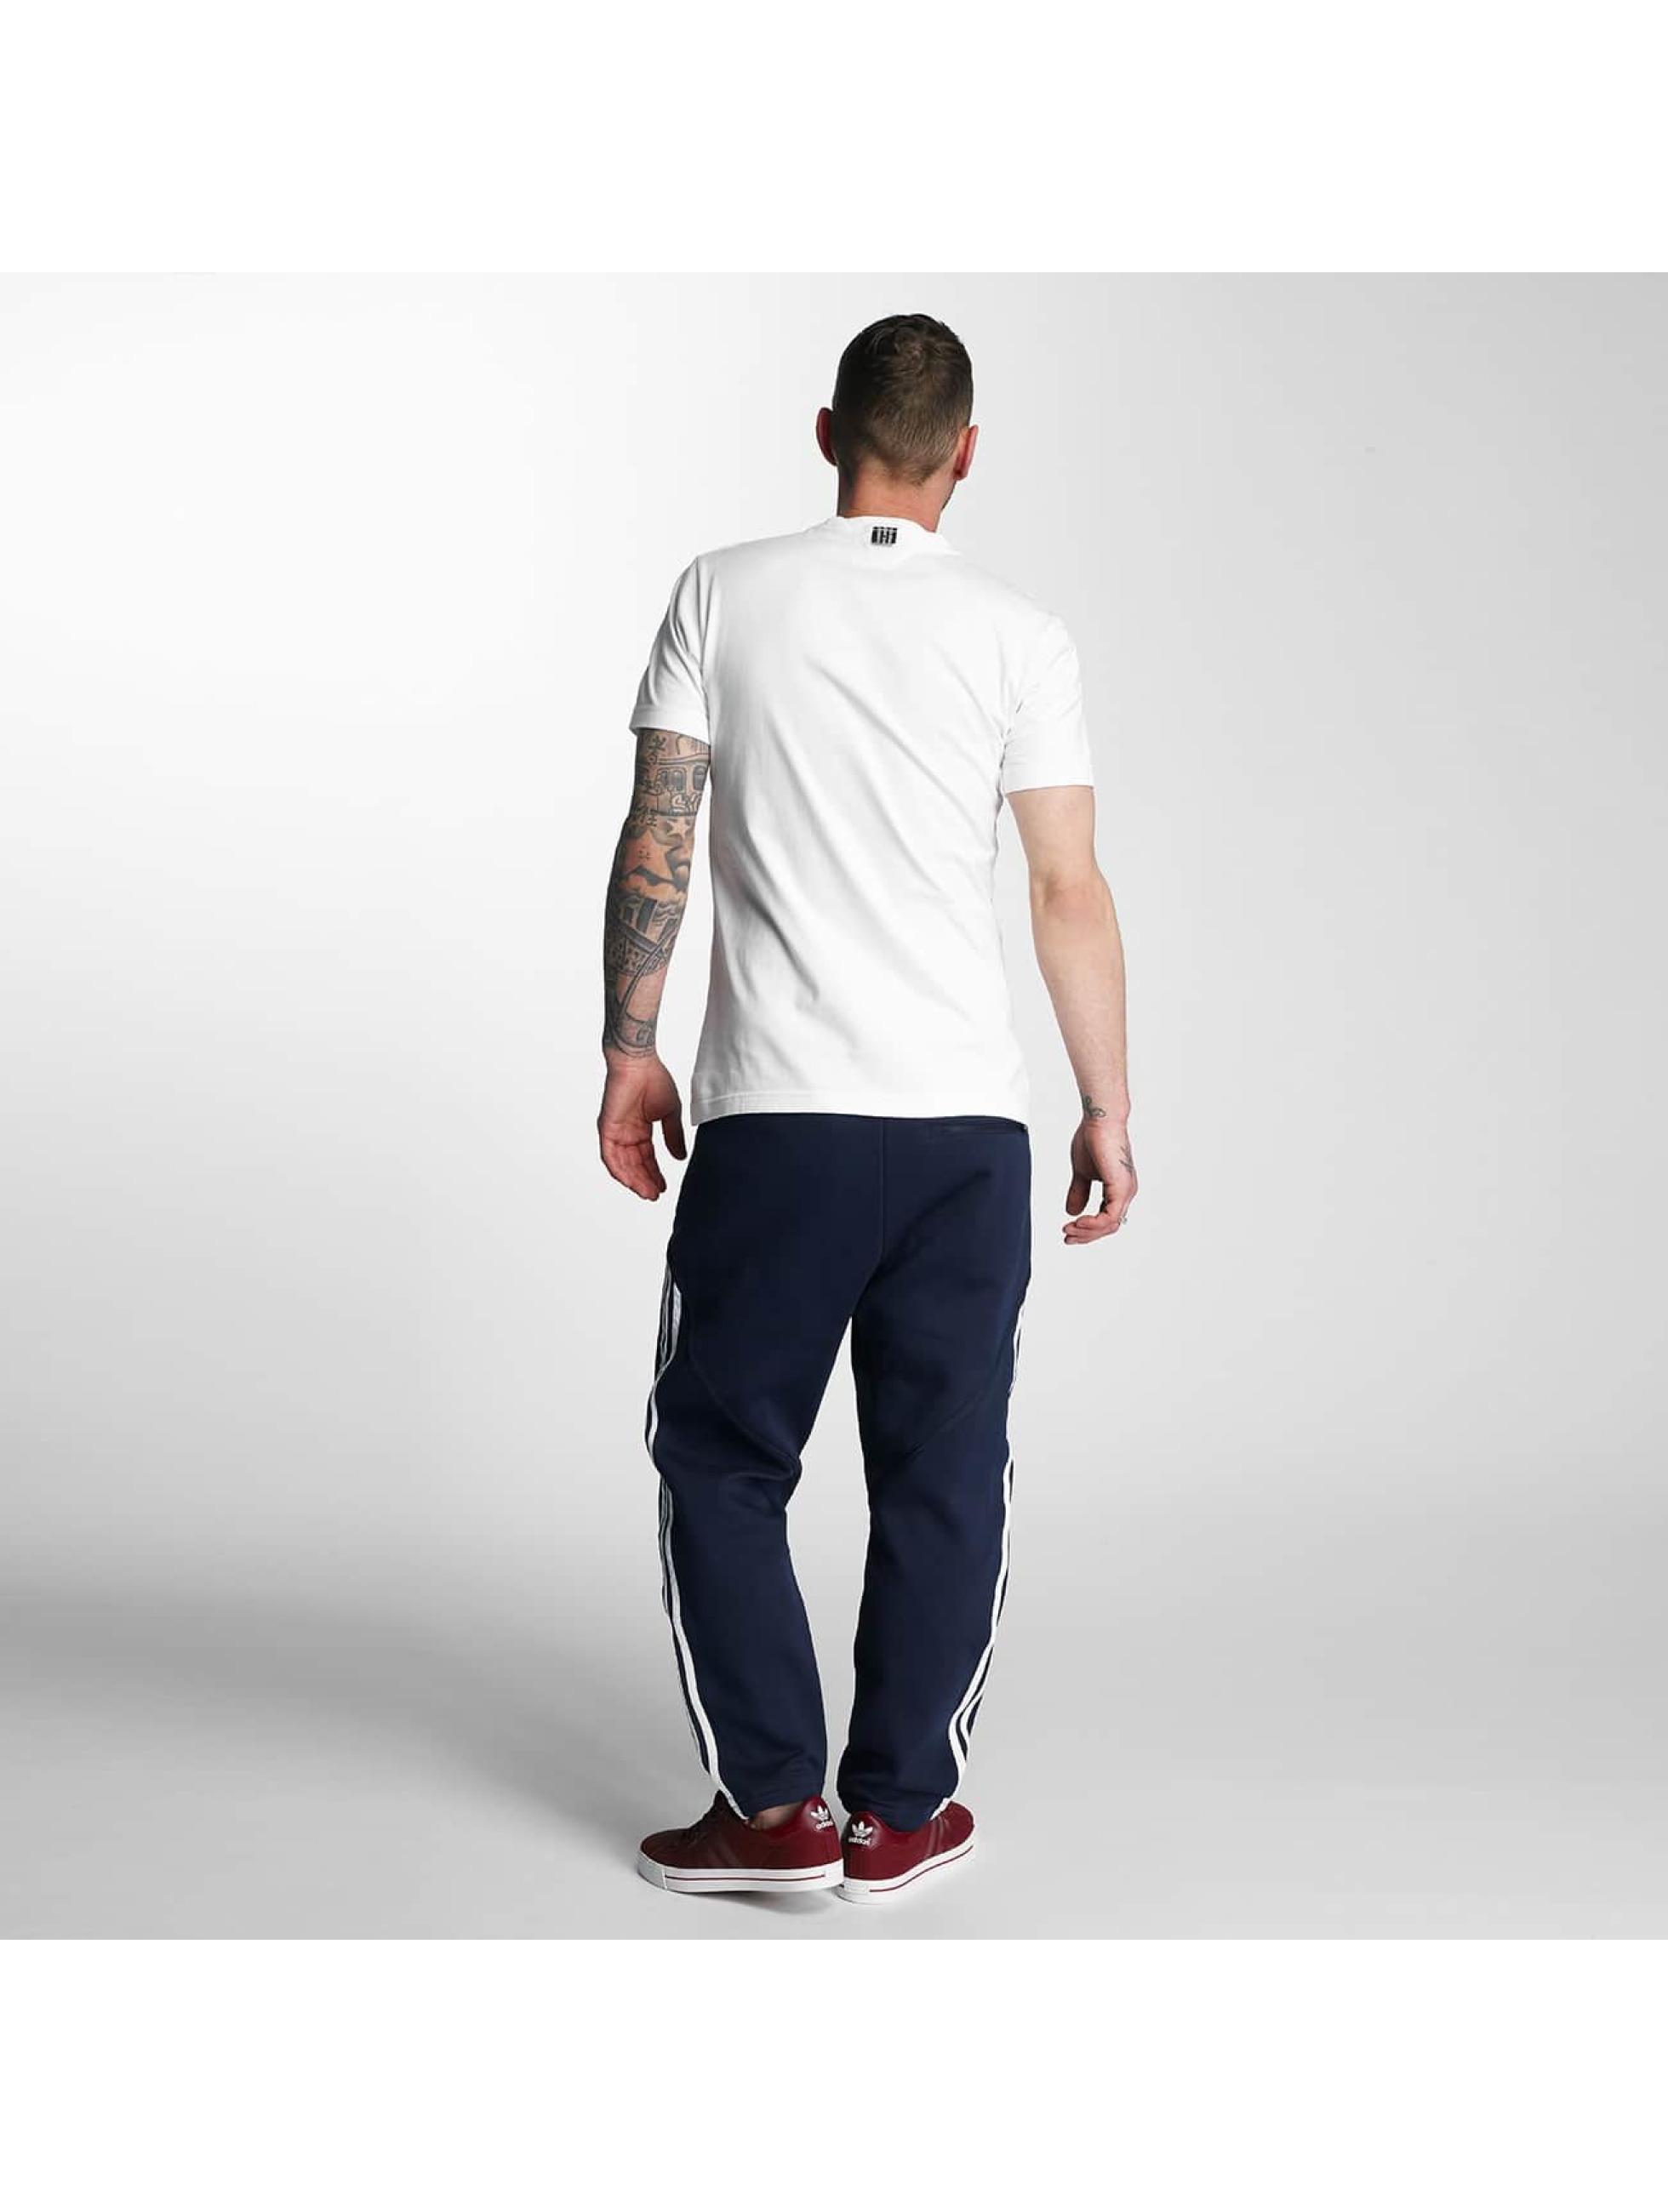 adidas originals Sweat Pant NMD blue